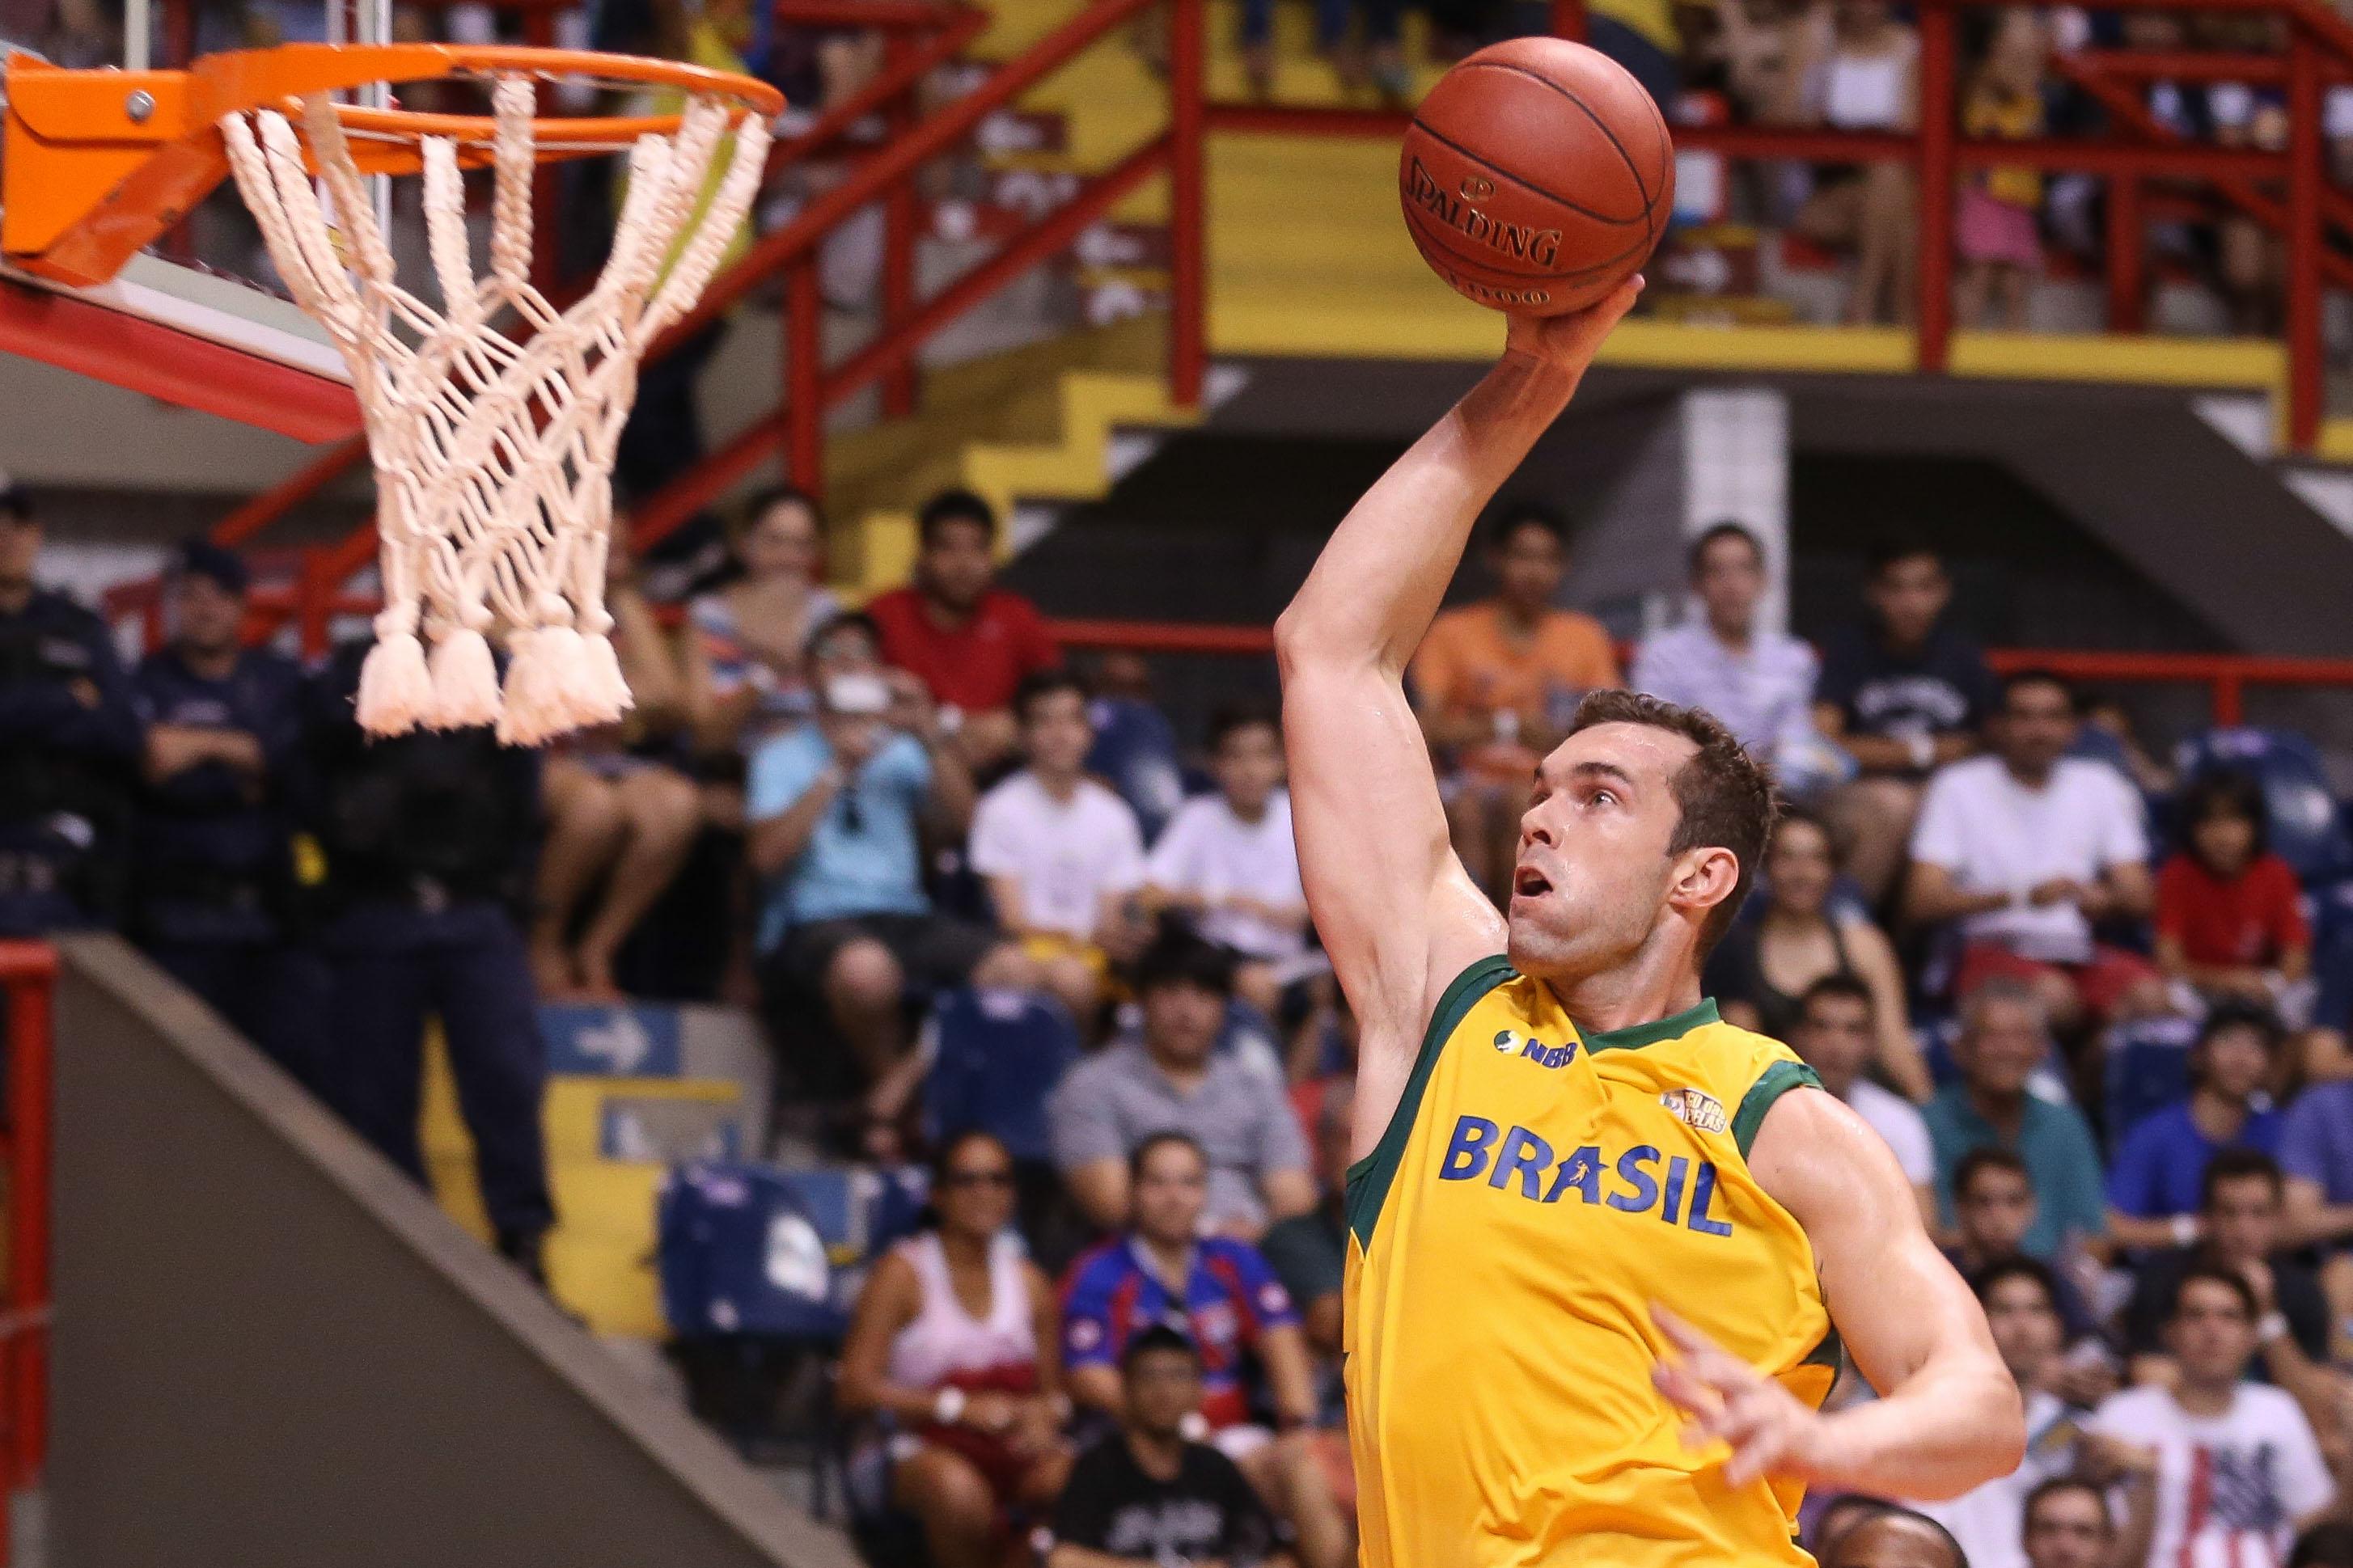 Murilo Becker, do NBB Brasil